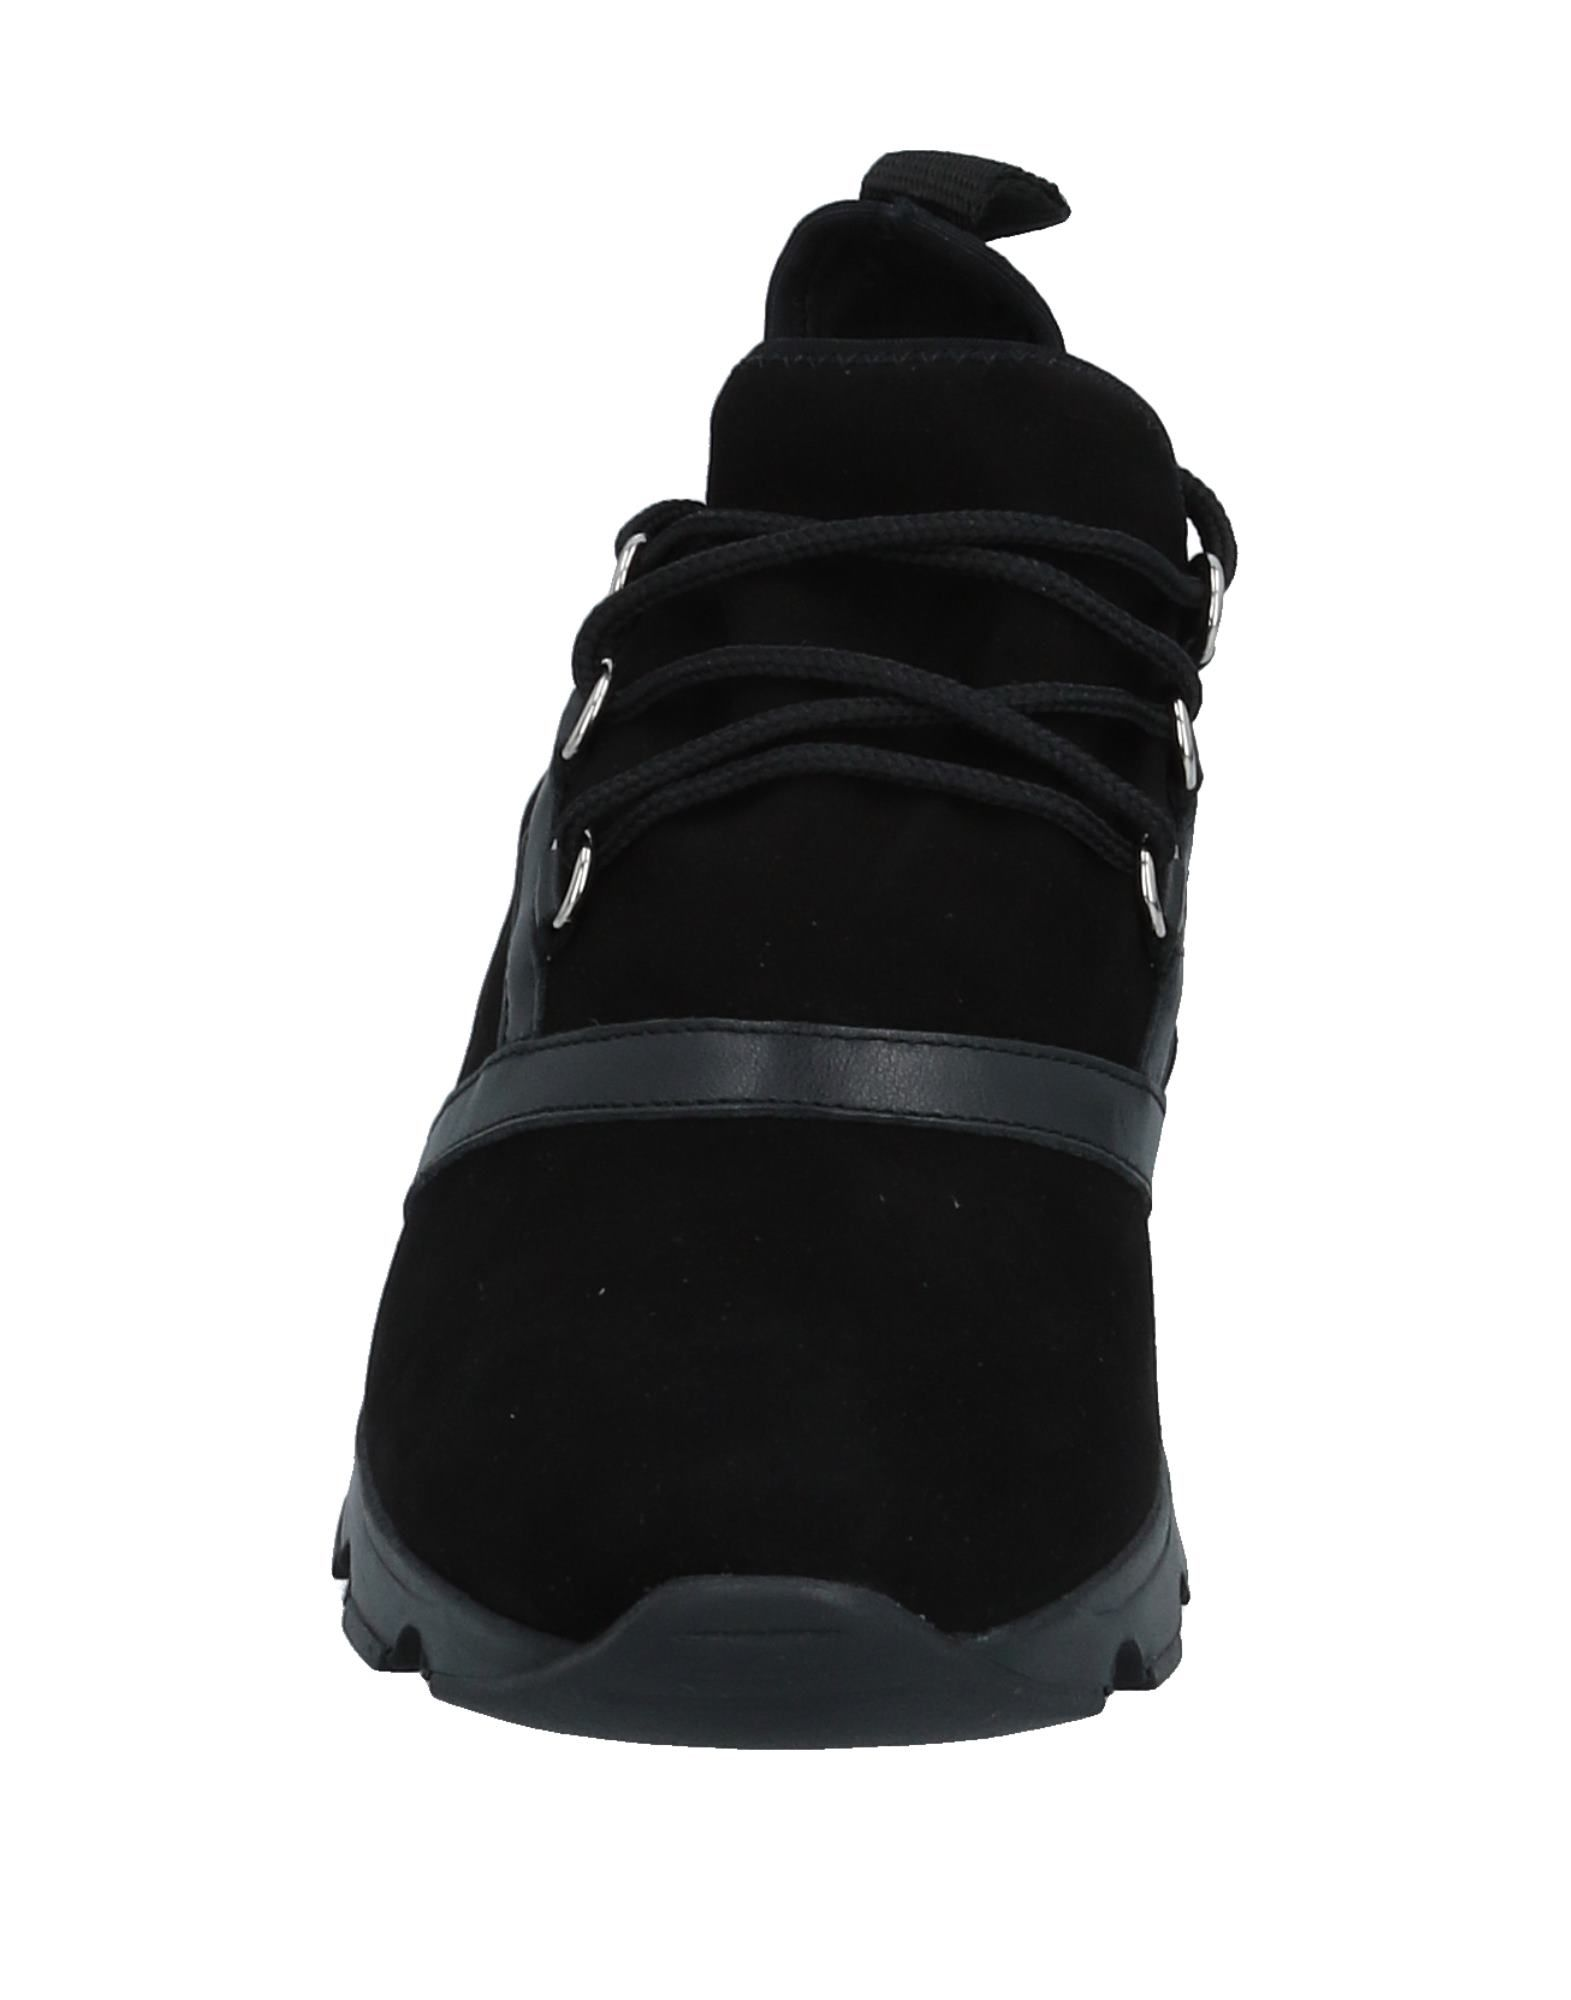 Carla G. Sneakers Damen Damen Damen  11522999SI Gute Qualität beliebte Schuhe 345f80